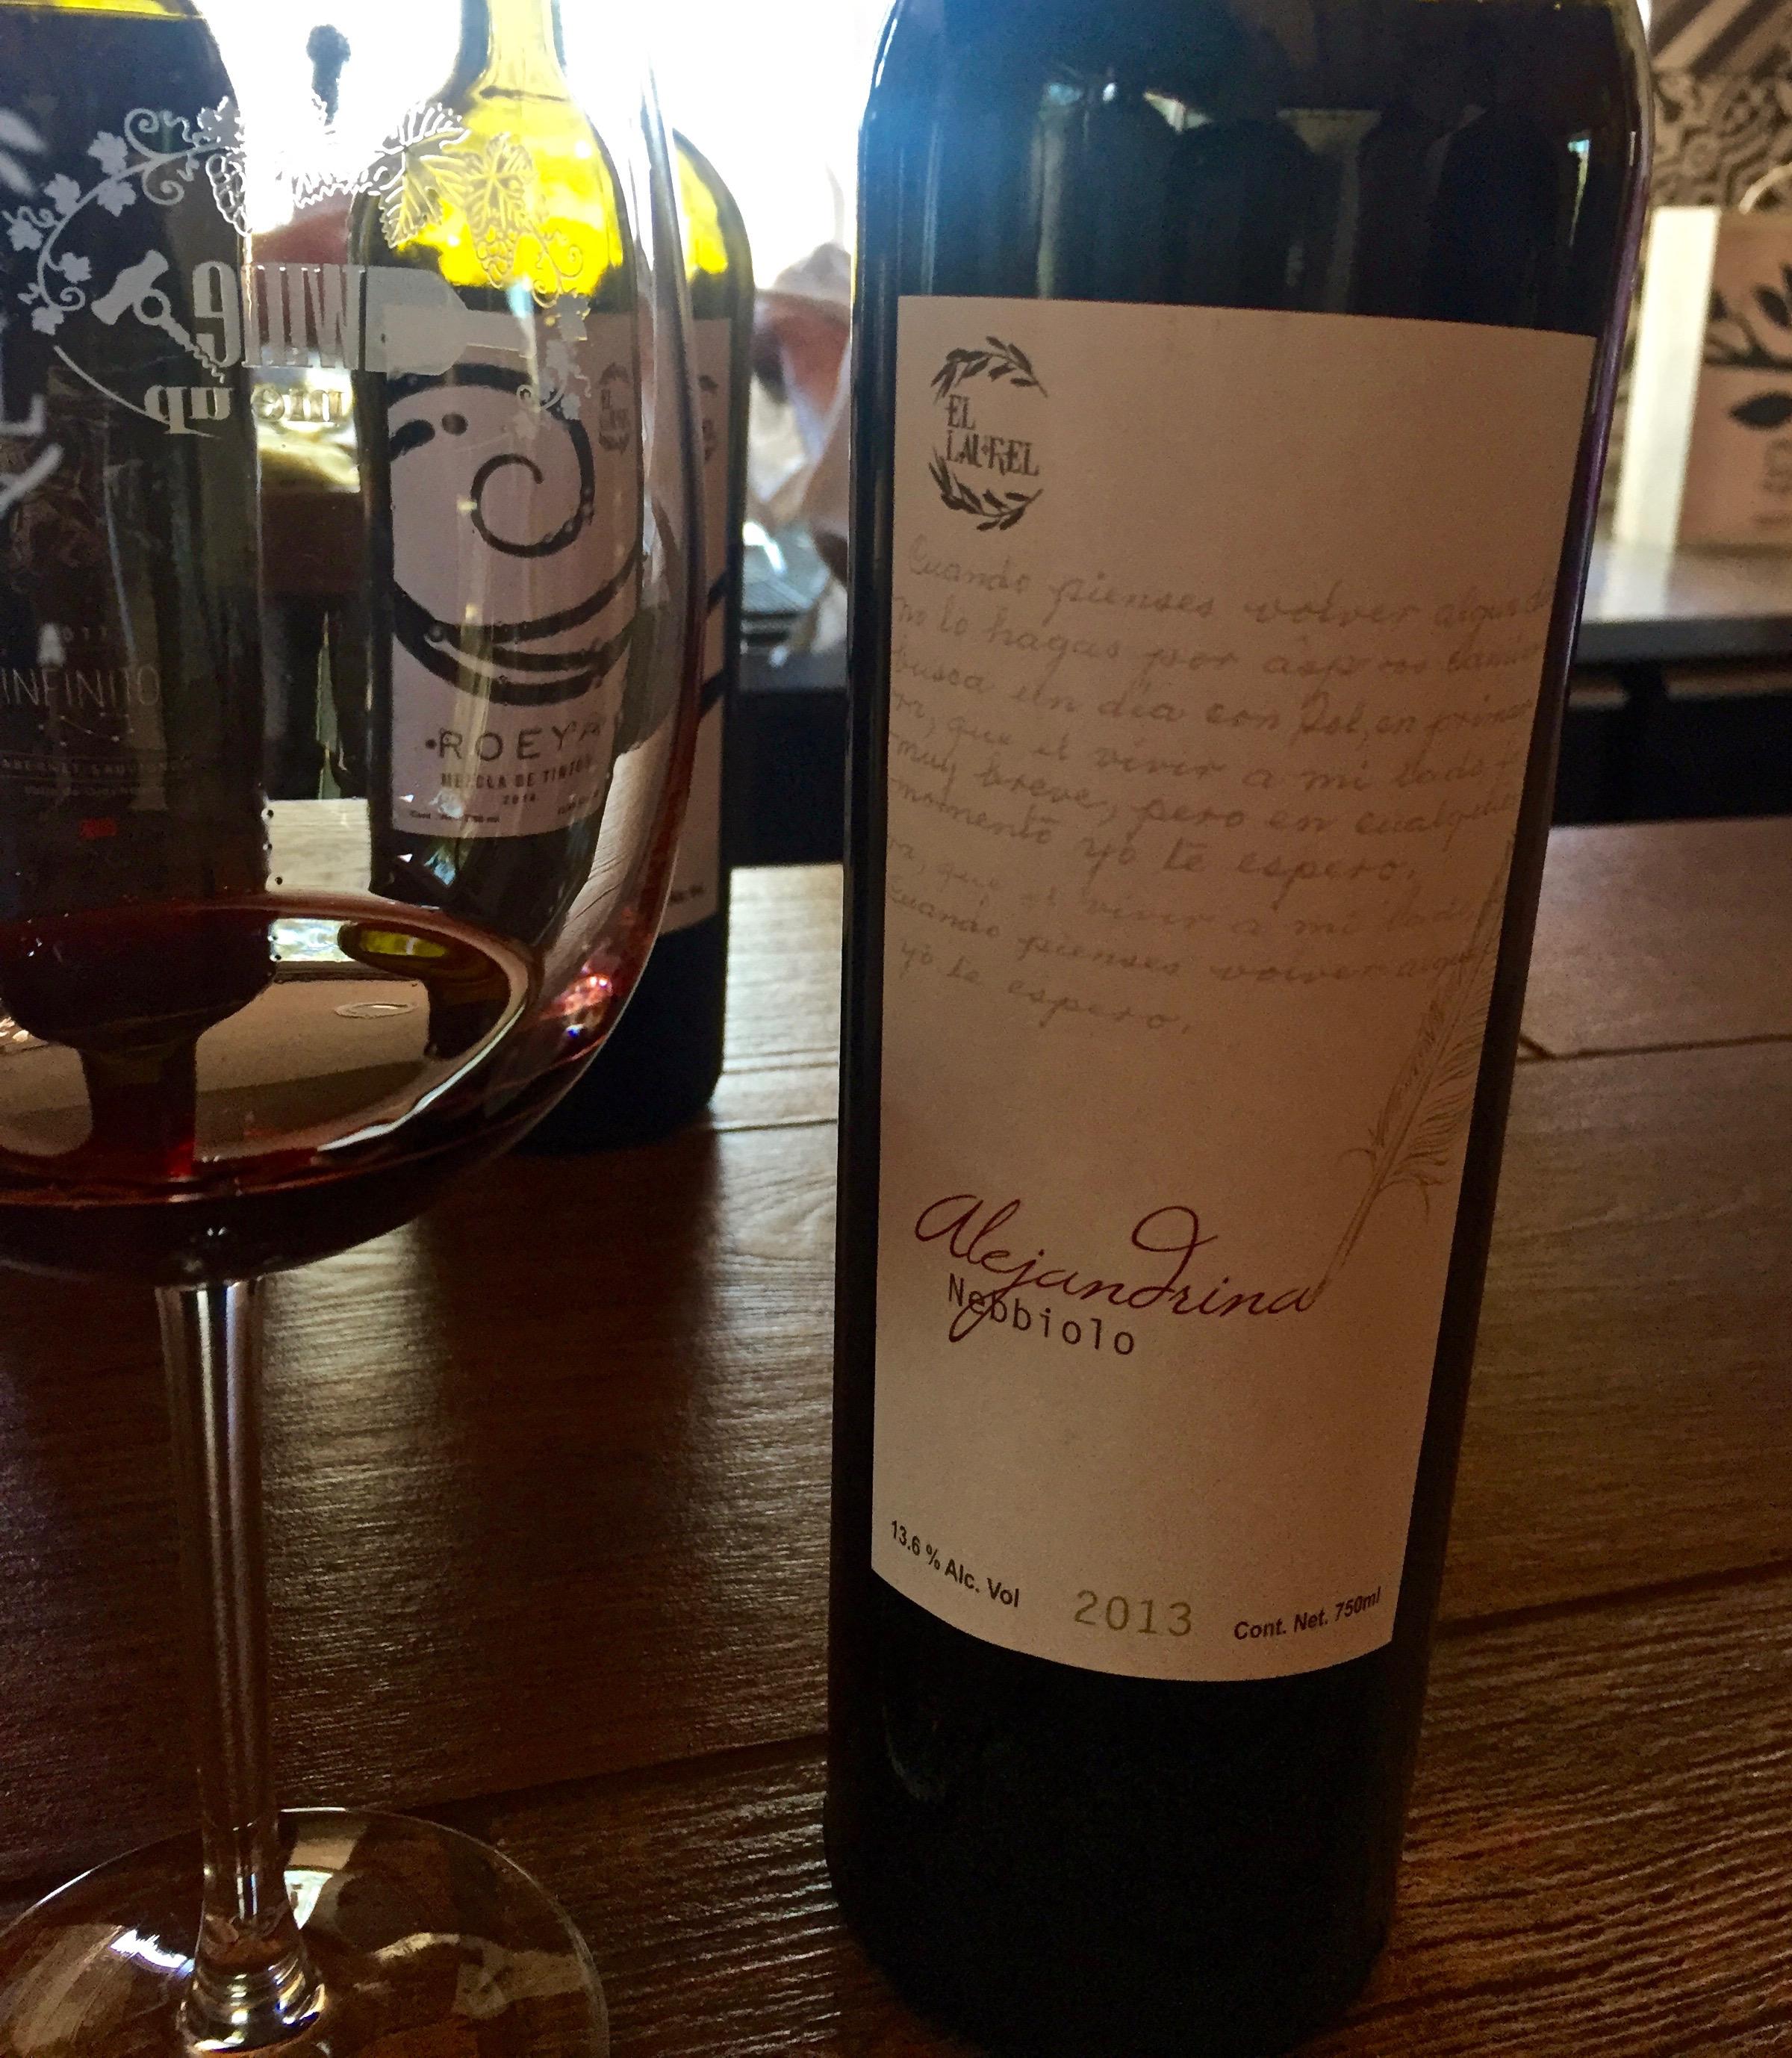 el laurel-alejandrina wine bottle.jpg